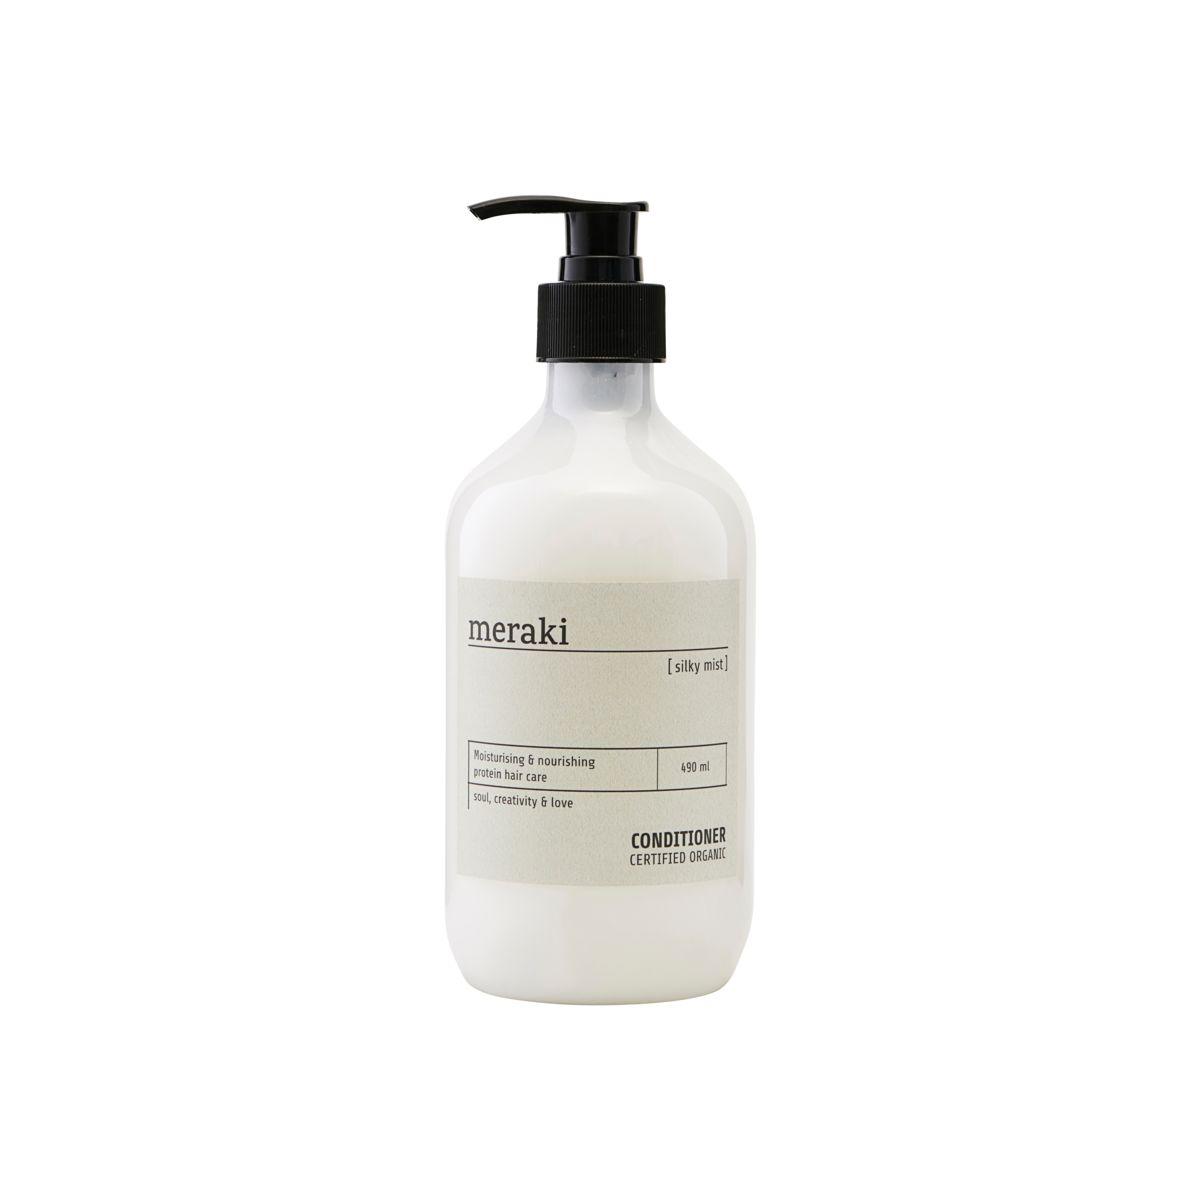 Meraki Silky Mist Conditioner, 490 ml